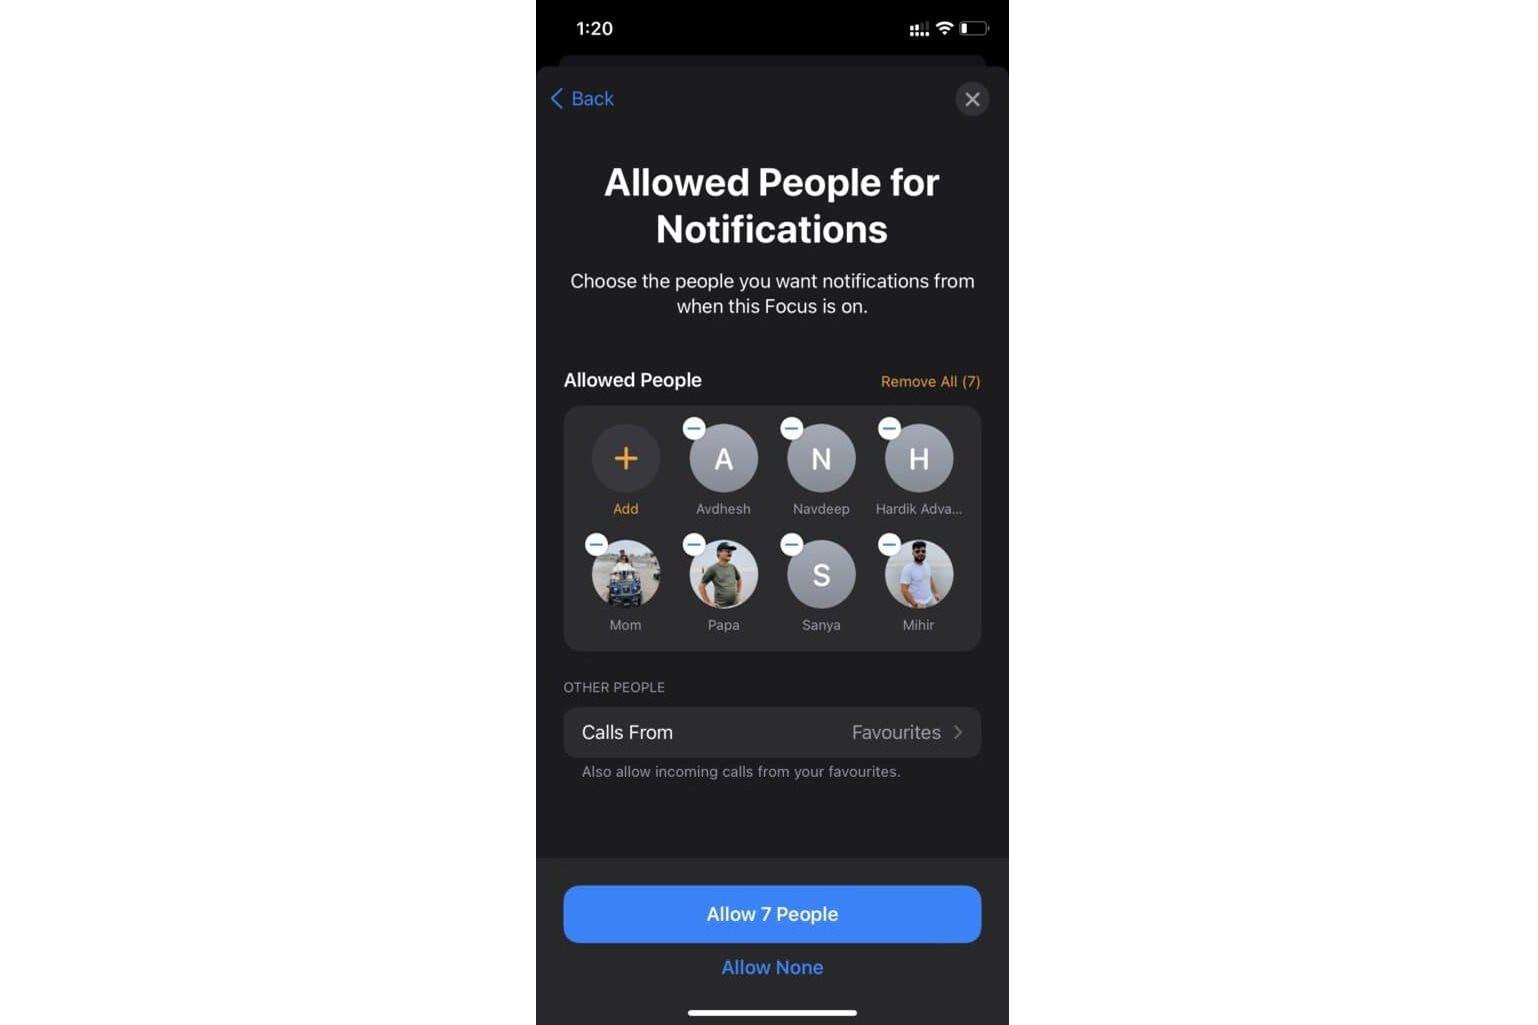 allowed-people-notification.jpg